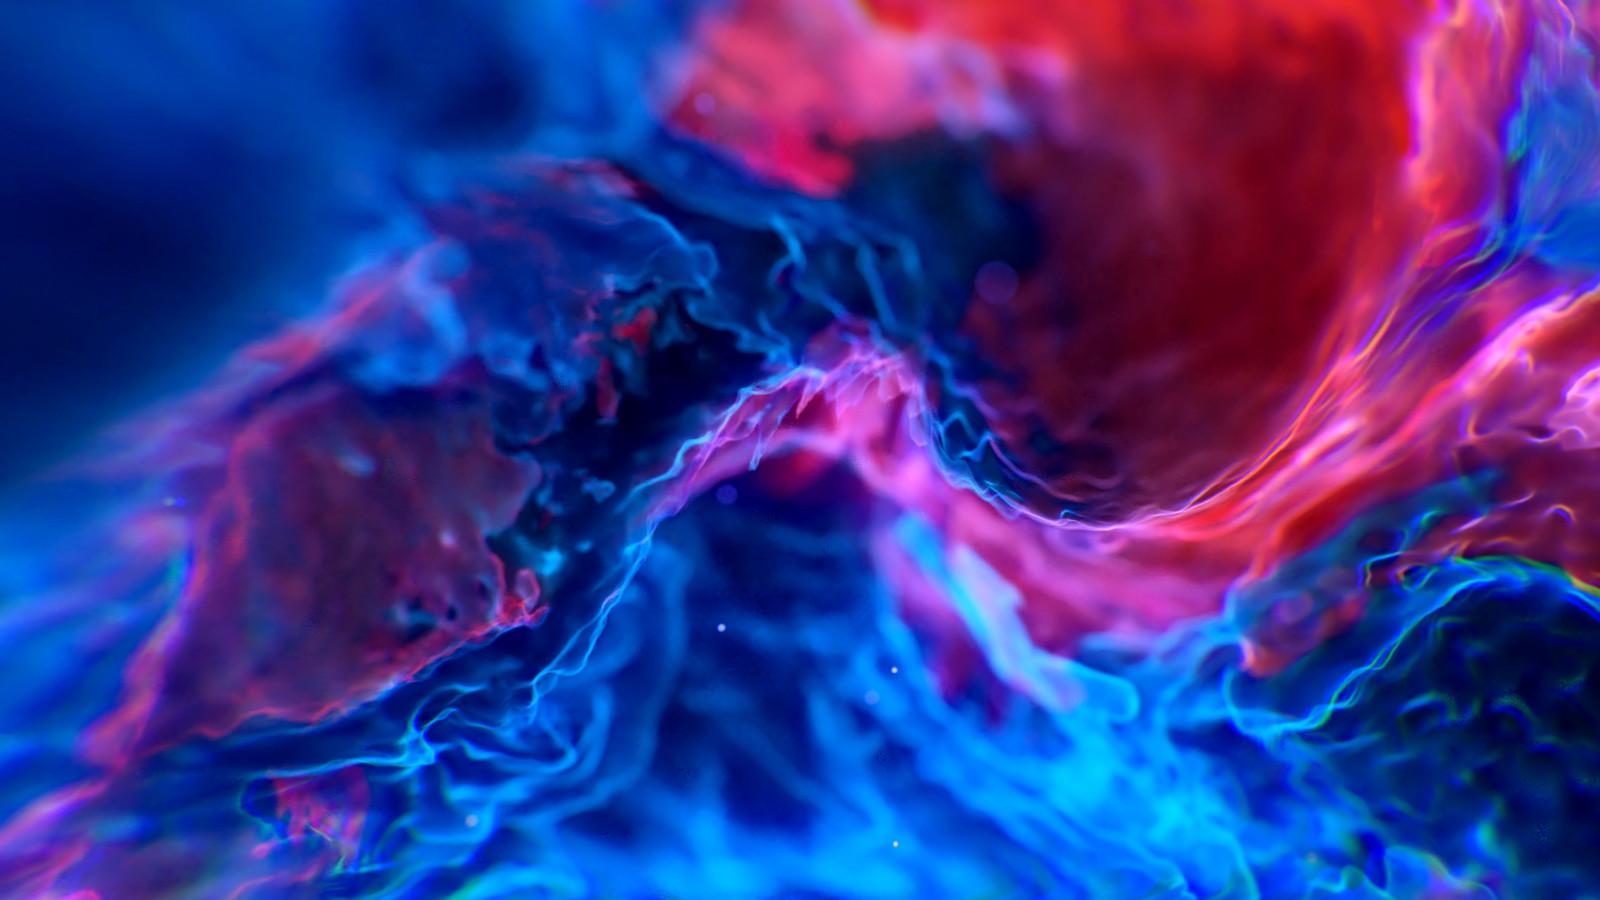 Nebula Collision